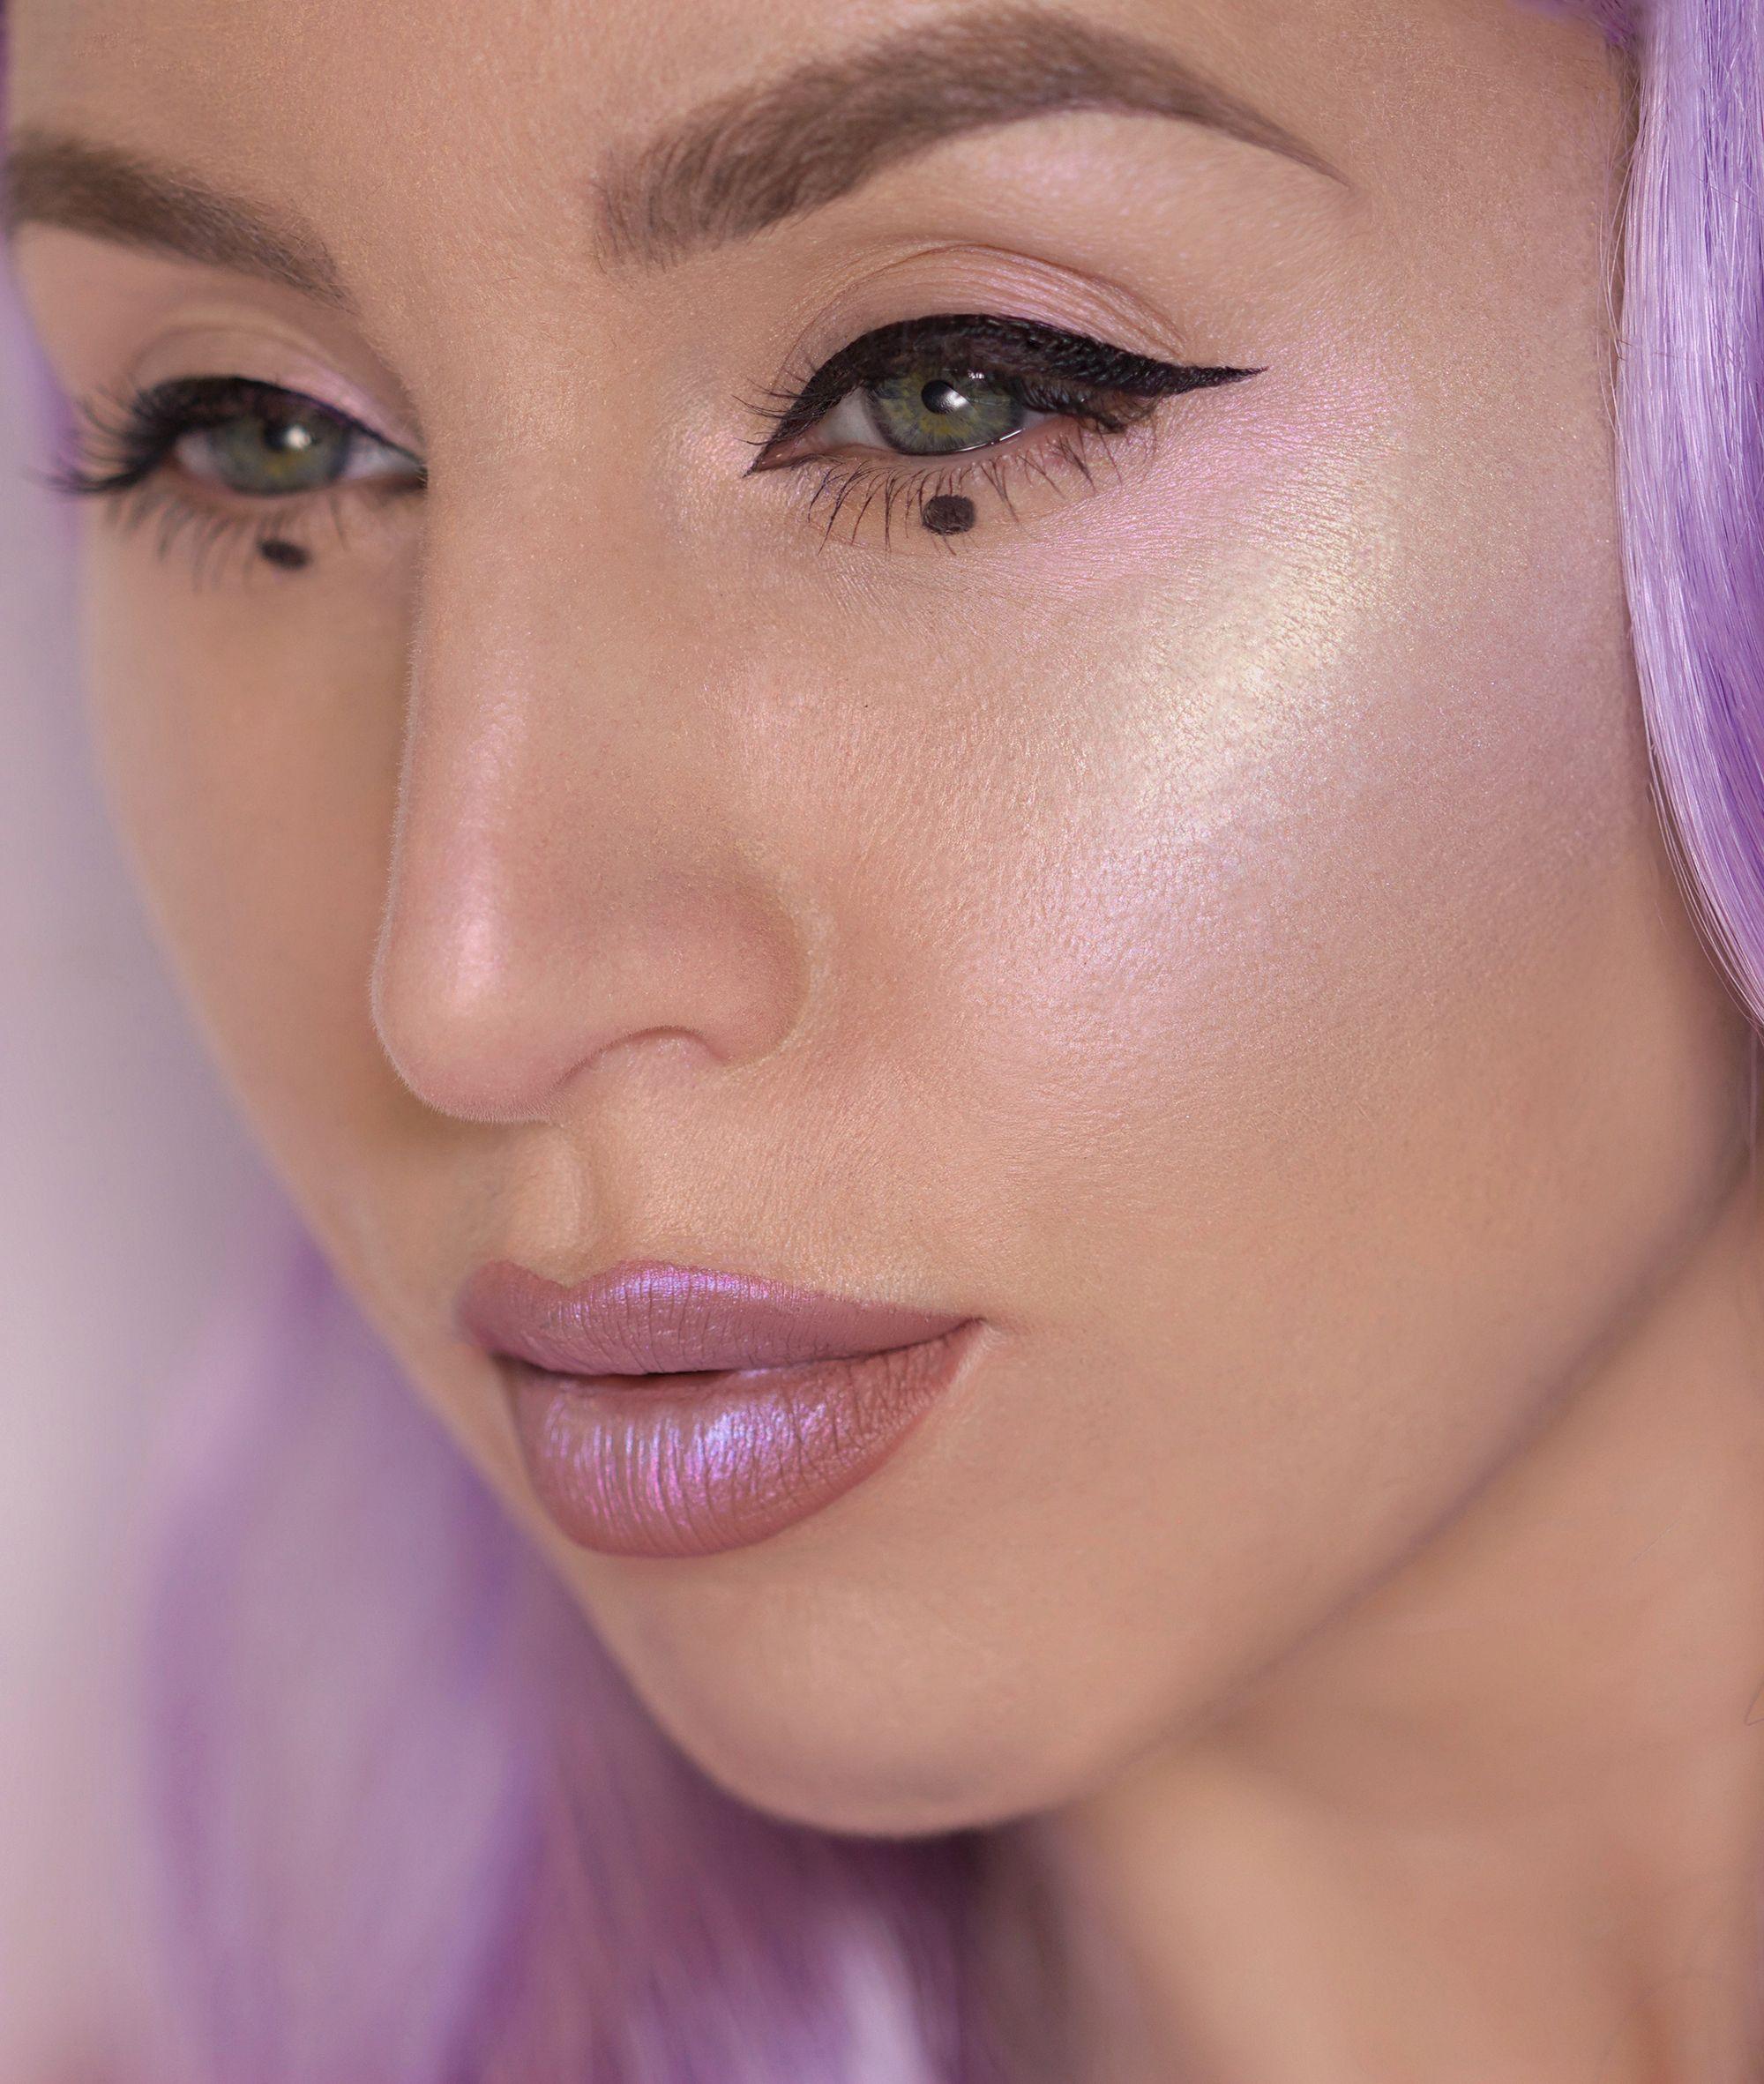 Rainbow / Unicorn highlighter look using MUA Prism